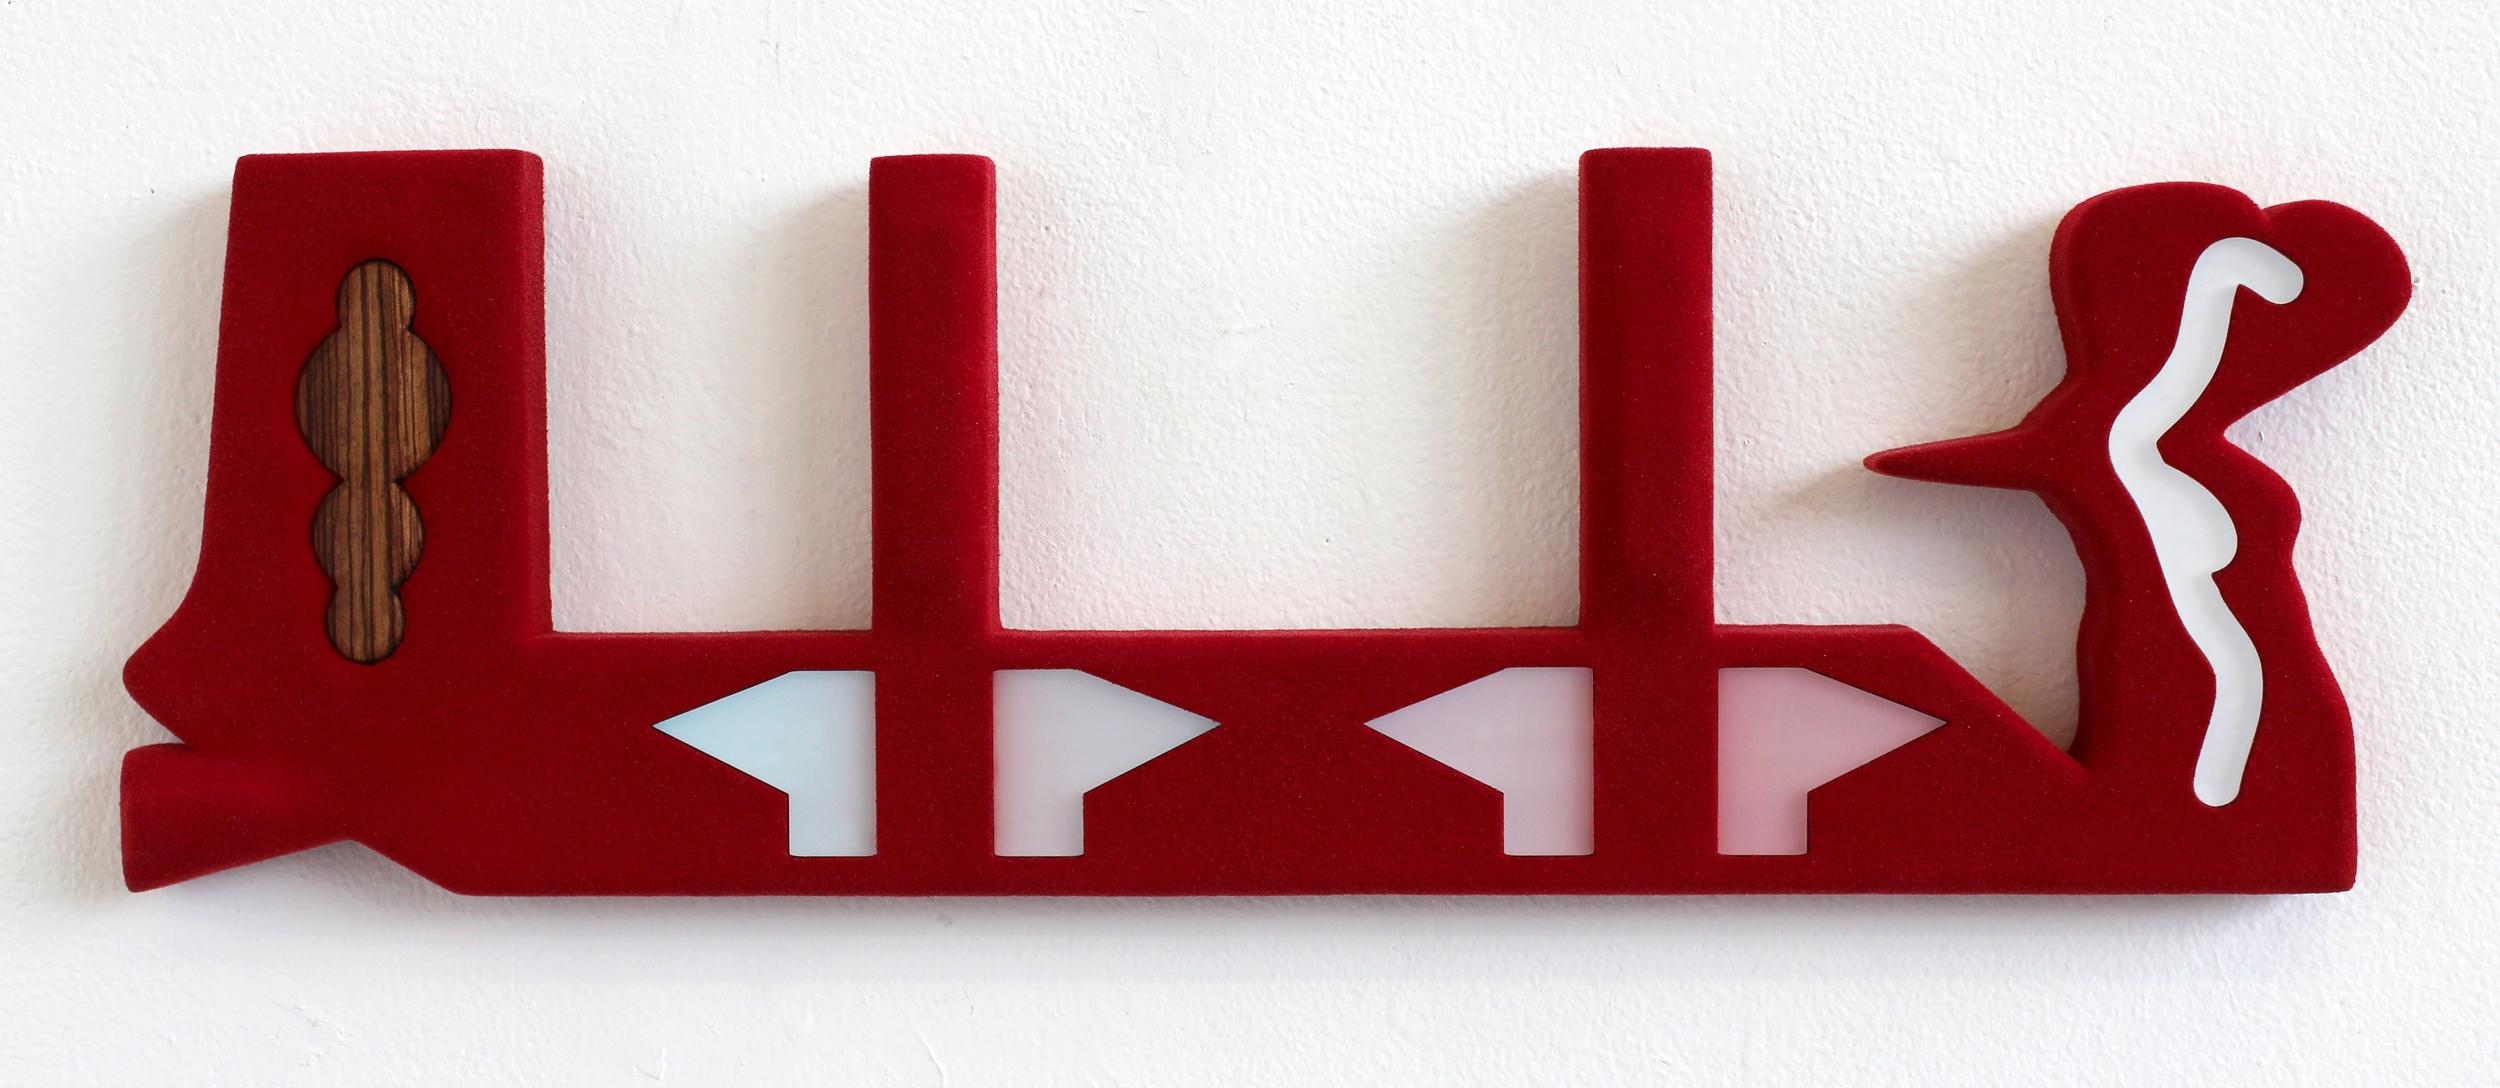 acrylic paint, flocking, zebra wood, cast acrylic and MDF 22 X 7 x 1.25 Inches